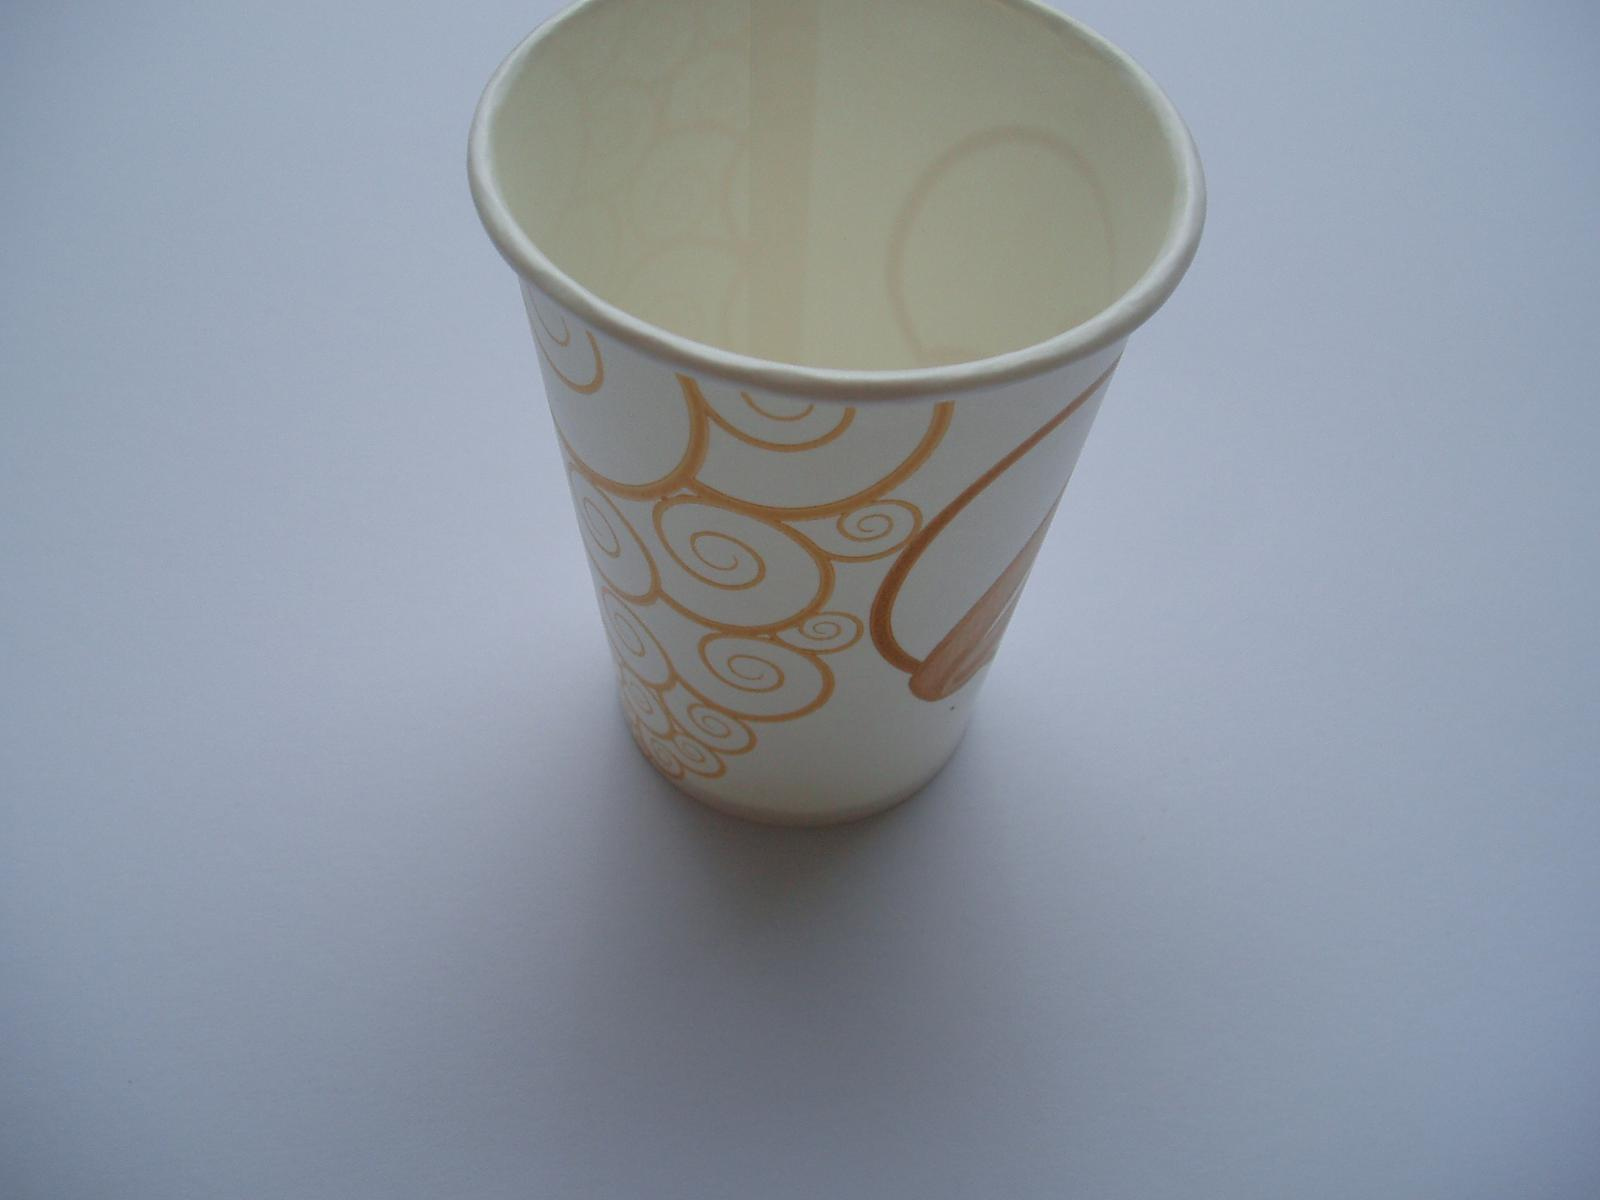 papírový pohárek - Obrázek č. 3